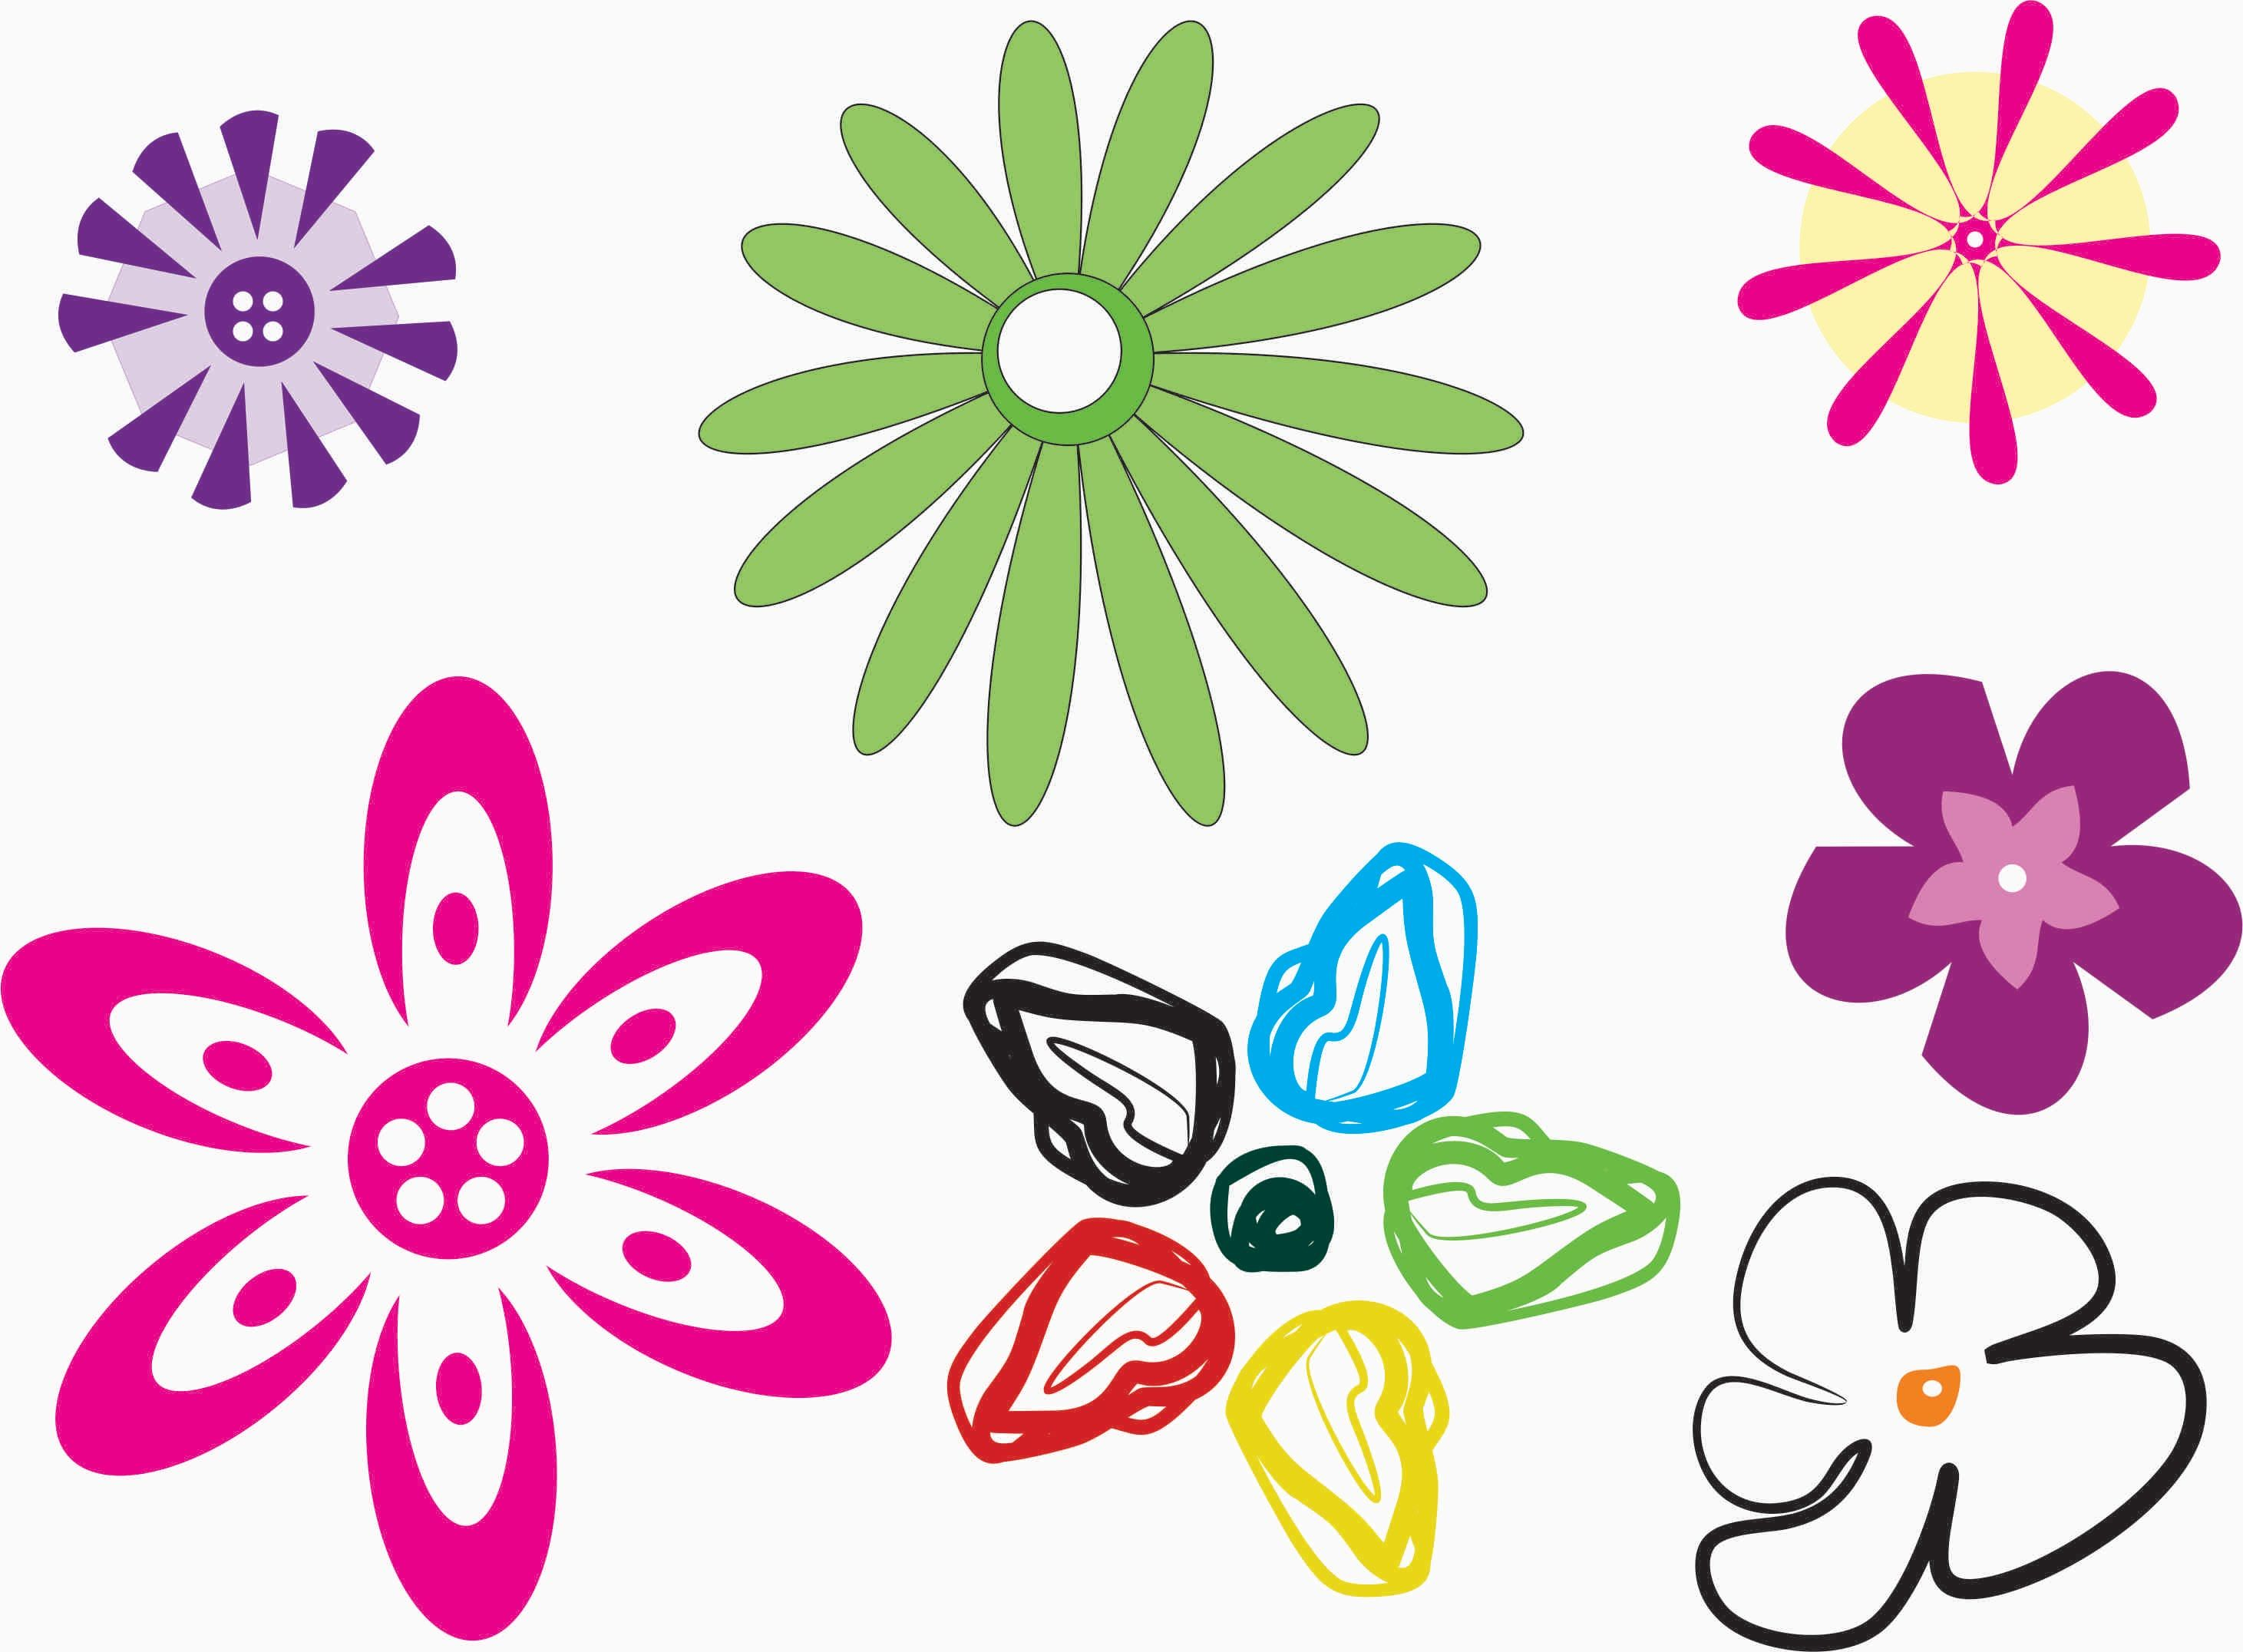 small resolution of tutorial corel draw como hacer flores basico c a r t